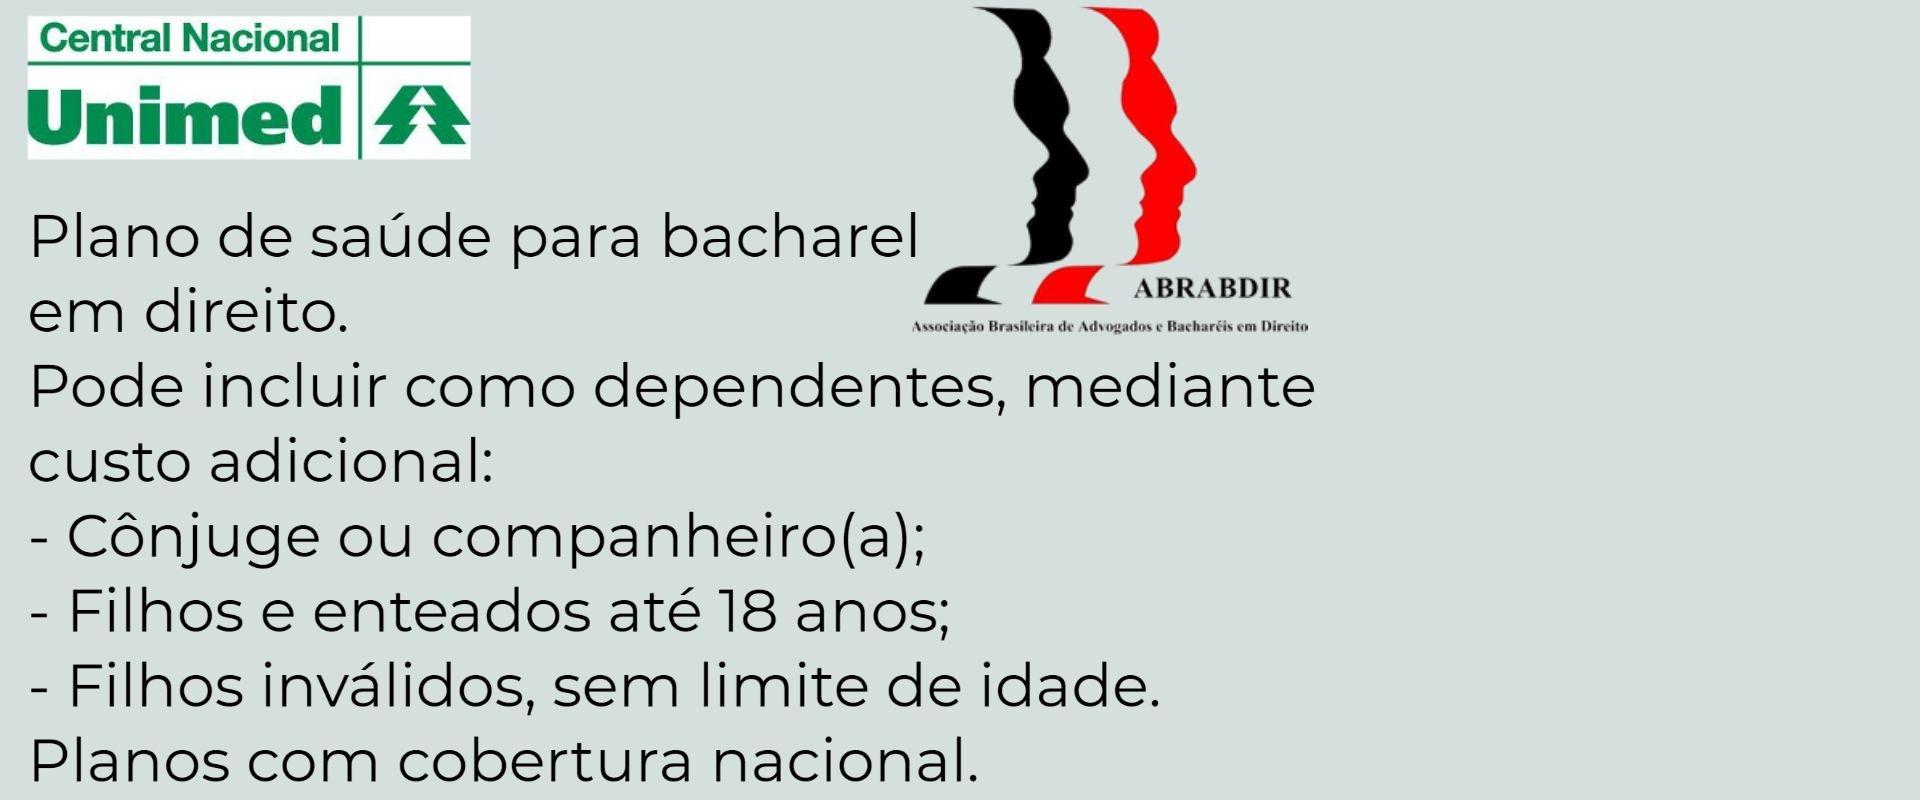 Unimed ABRABDIR Carapicuíba